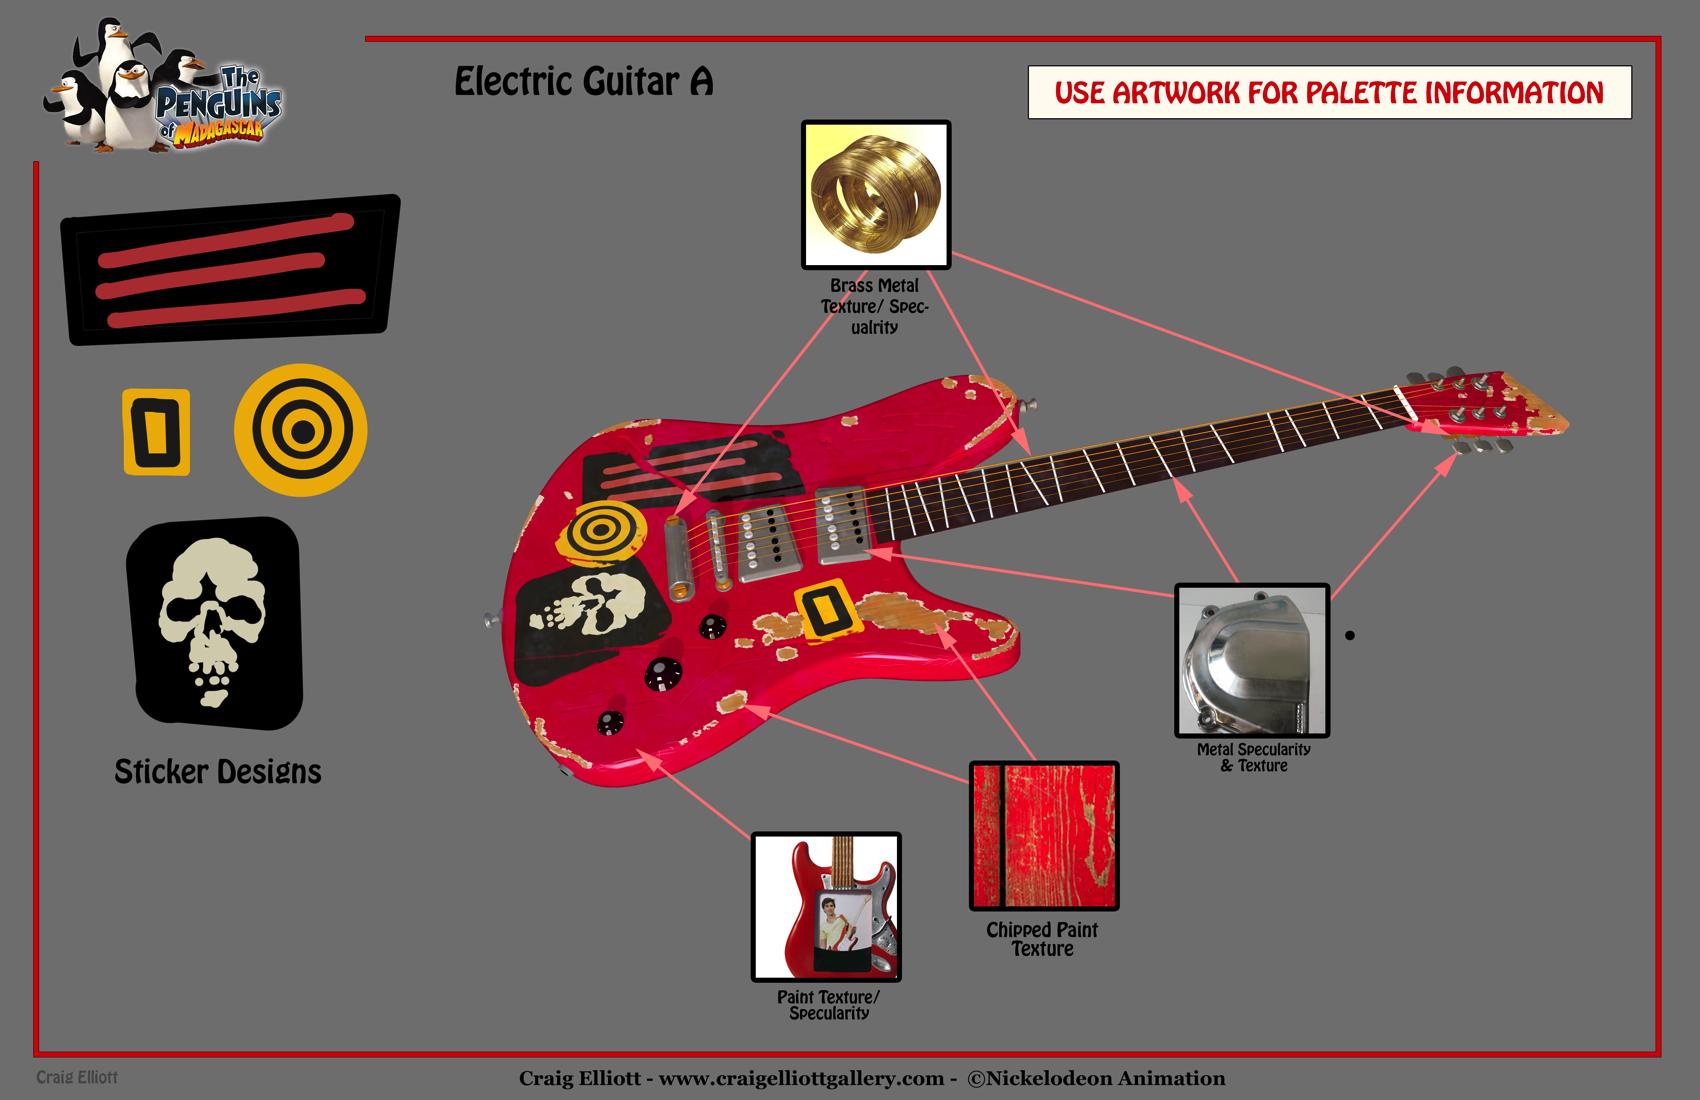 Electric Guitar A.jpg